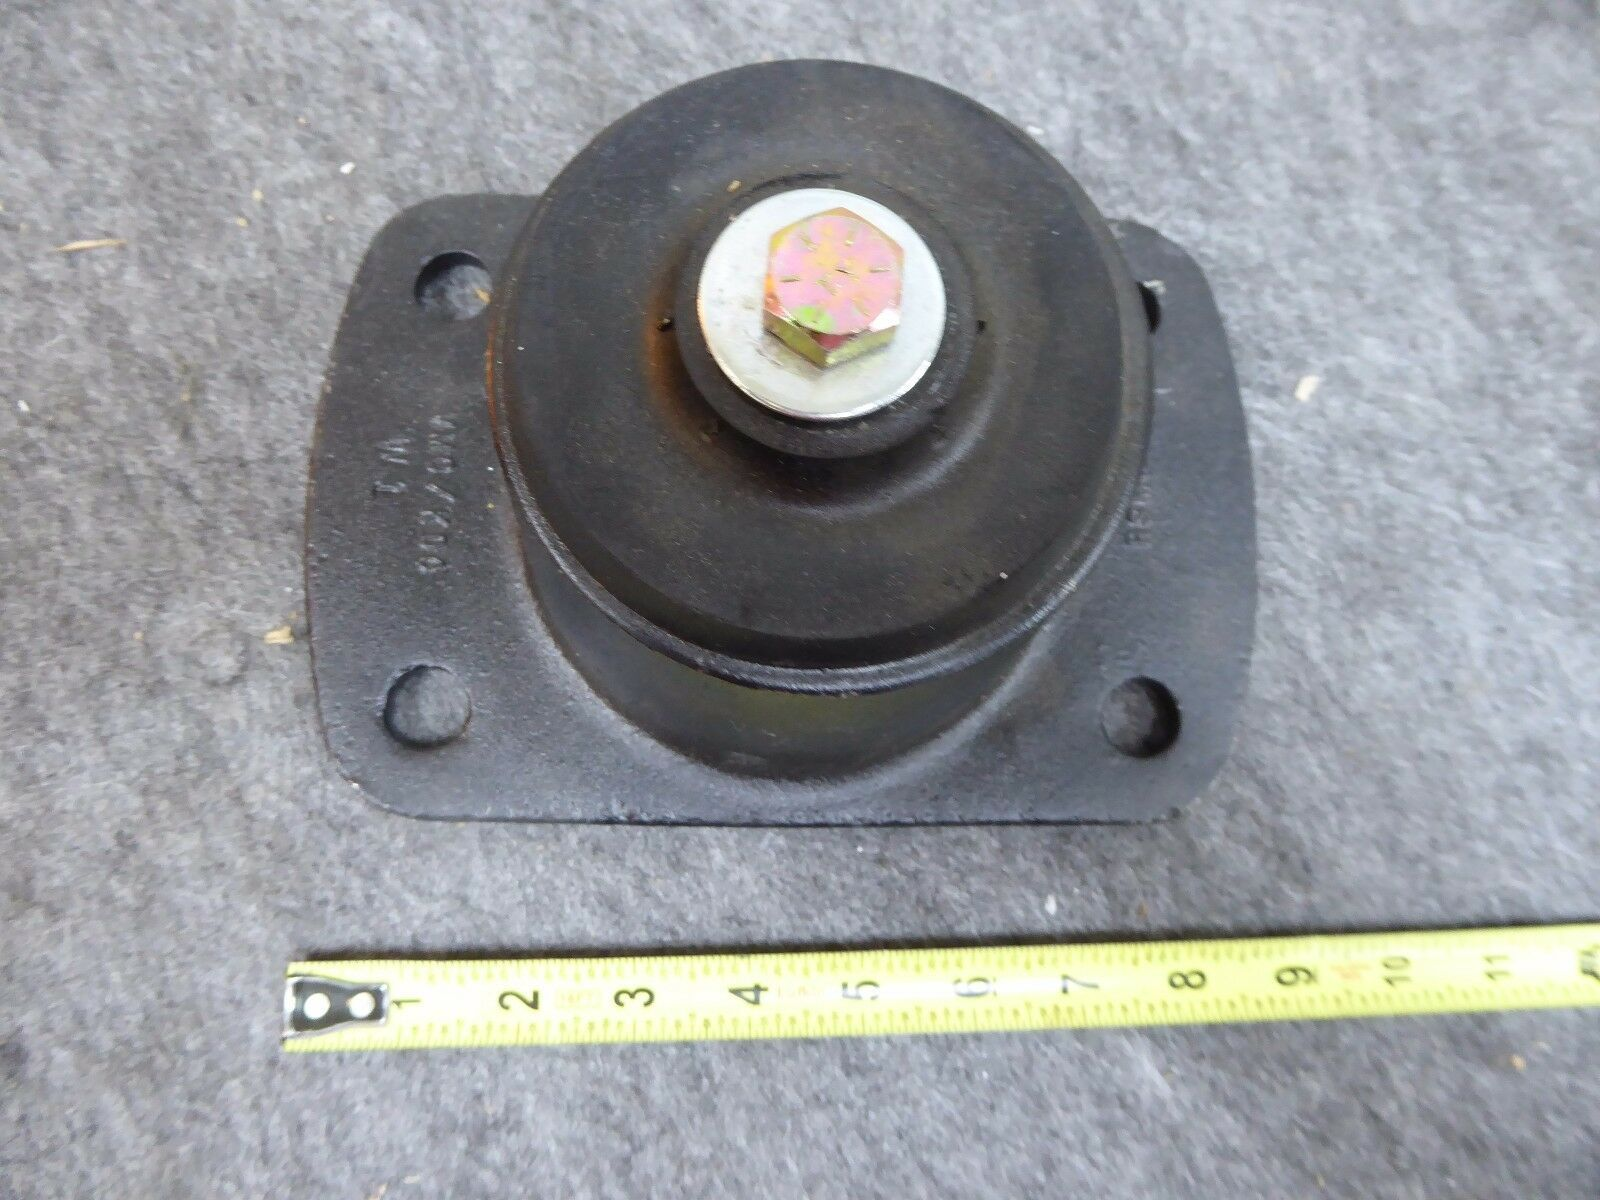 RSM3-700 VMC Sessmic Elastomeric shock and Vibrator Isolator